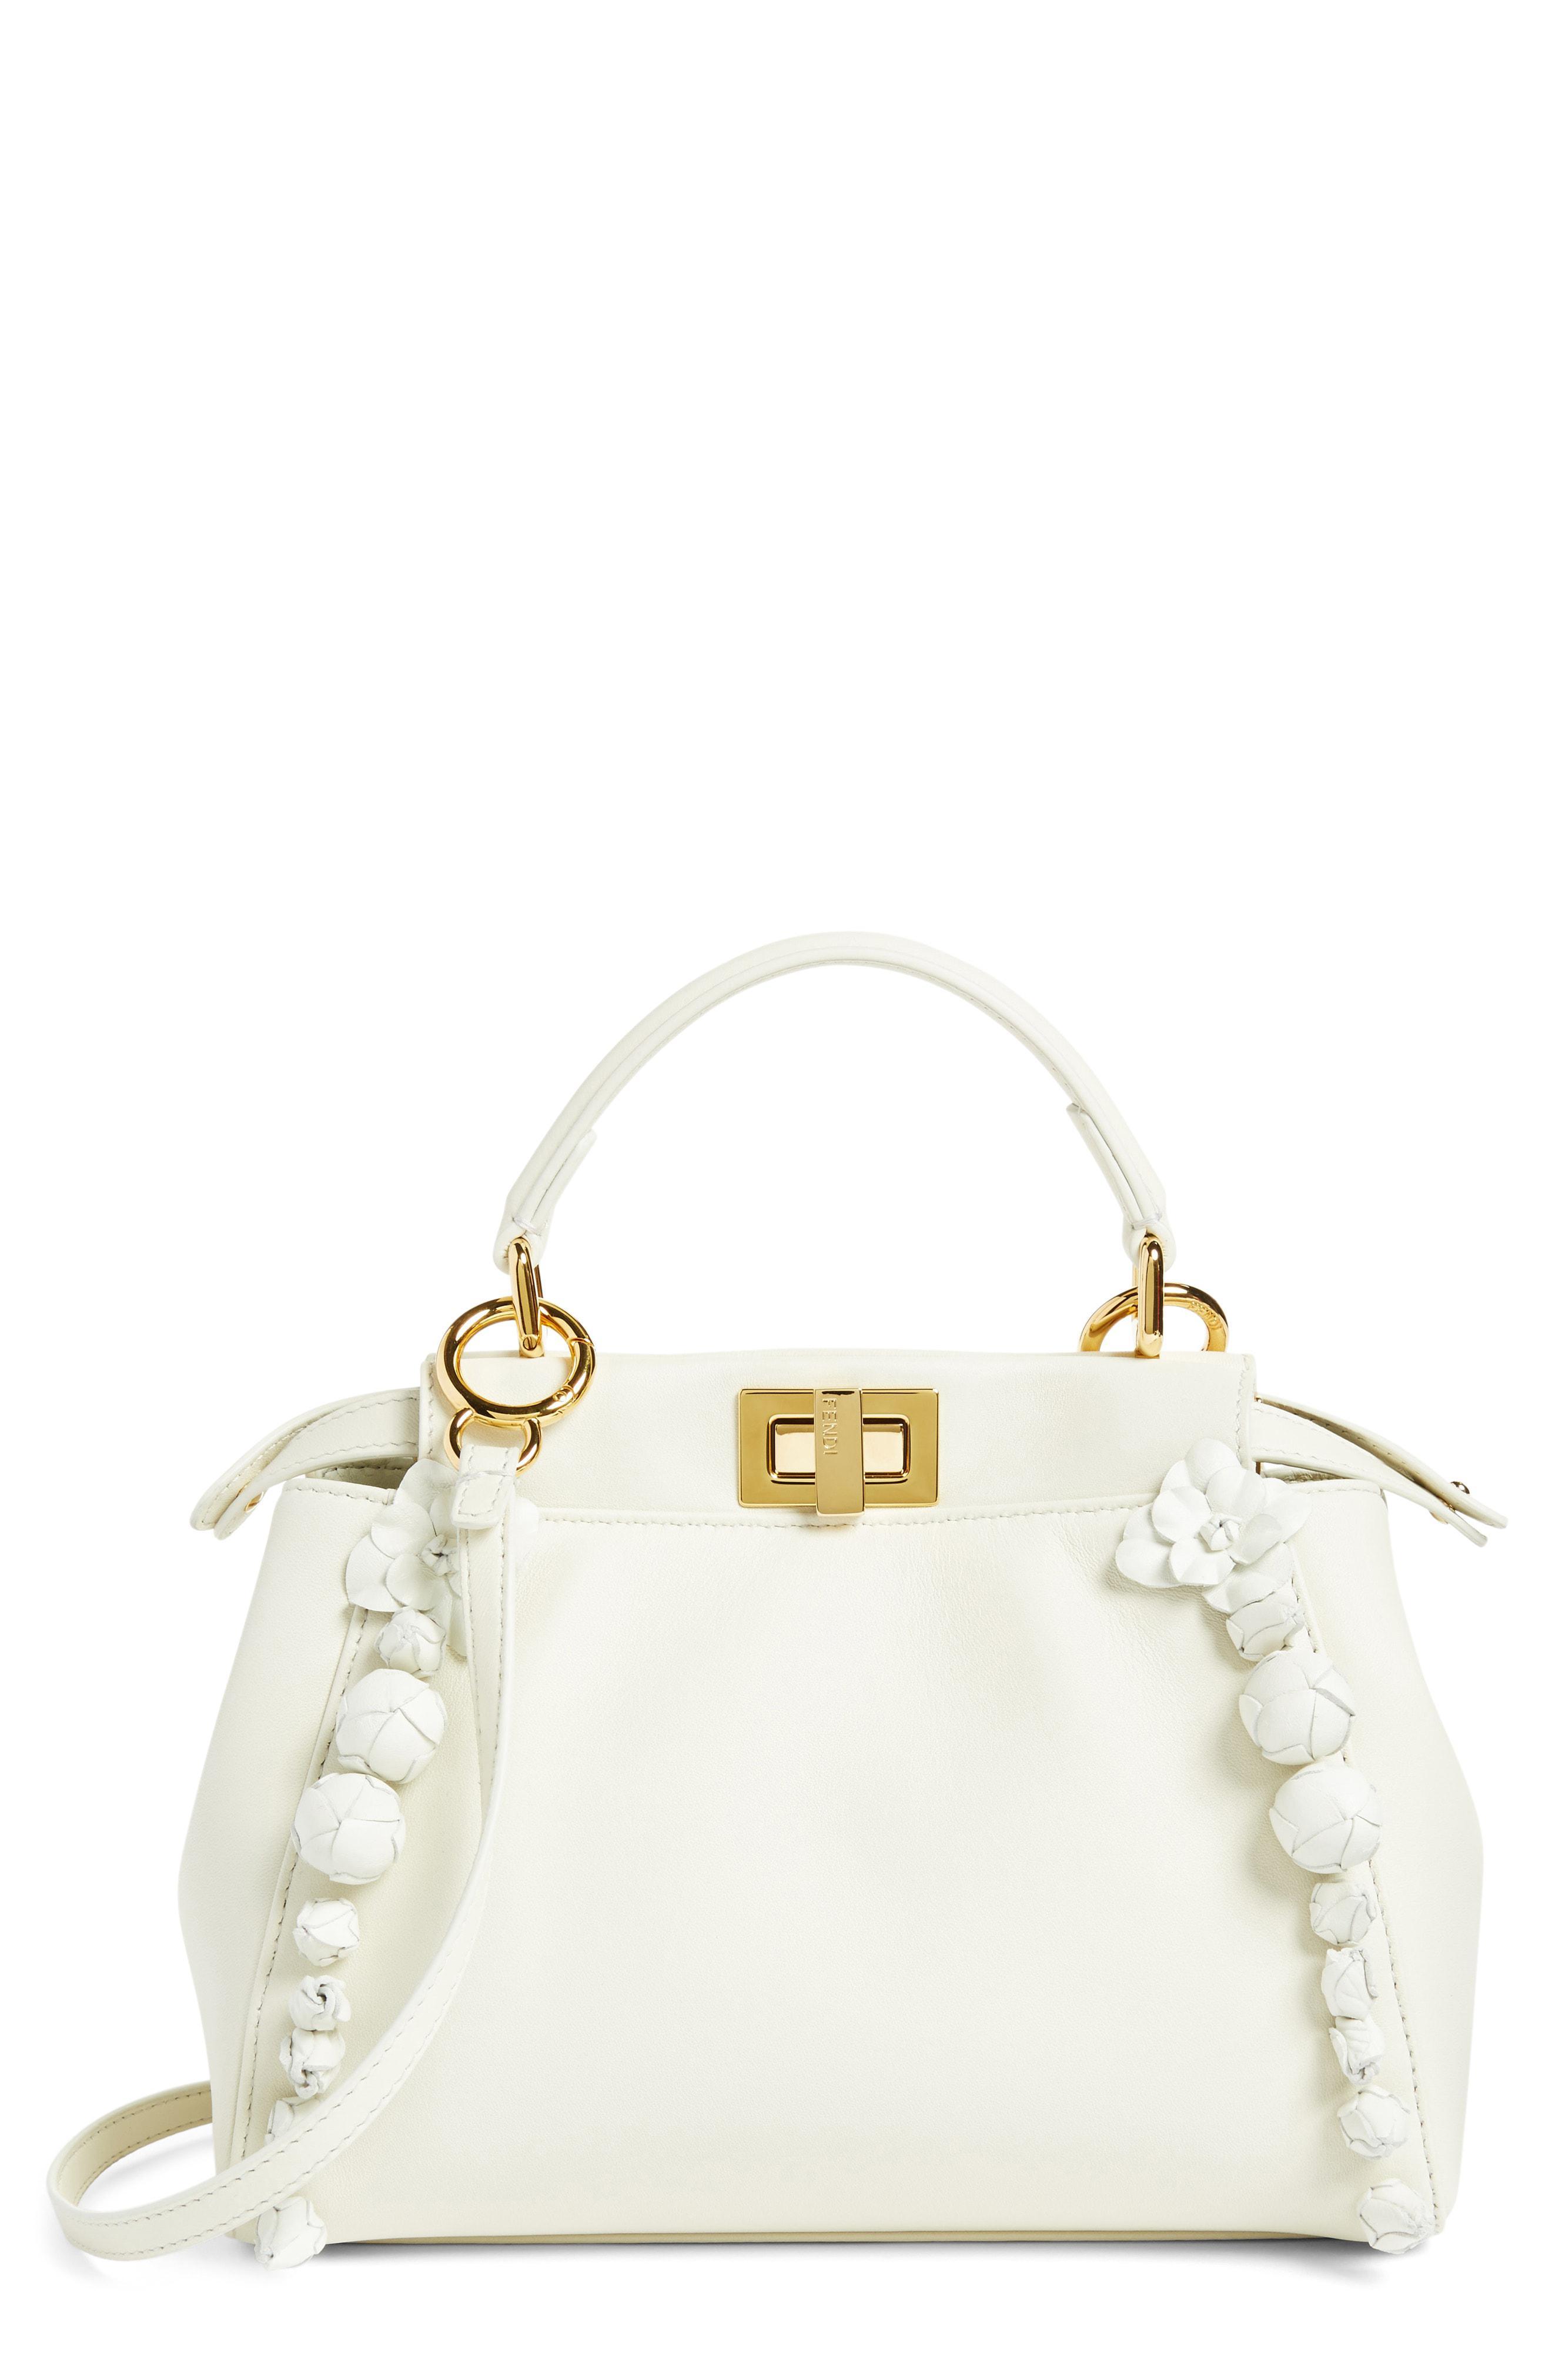 3666196b76 Fendi - Multicolor Mini Peekaboo Floral Leather Satchel - - Lyst. View  fullscreen